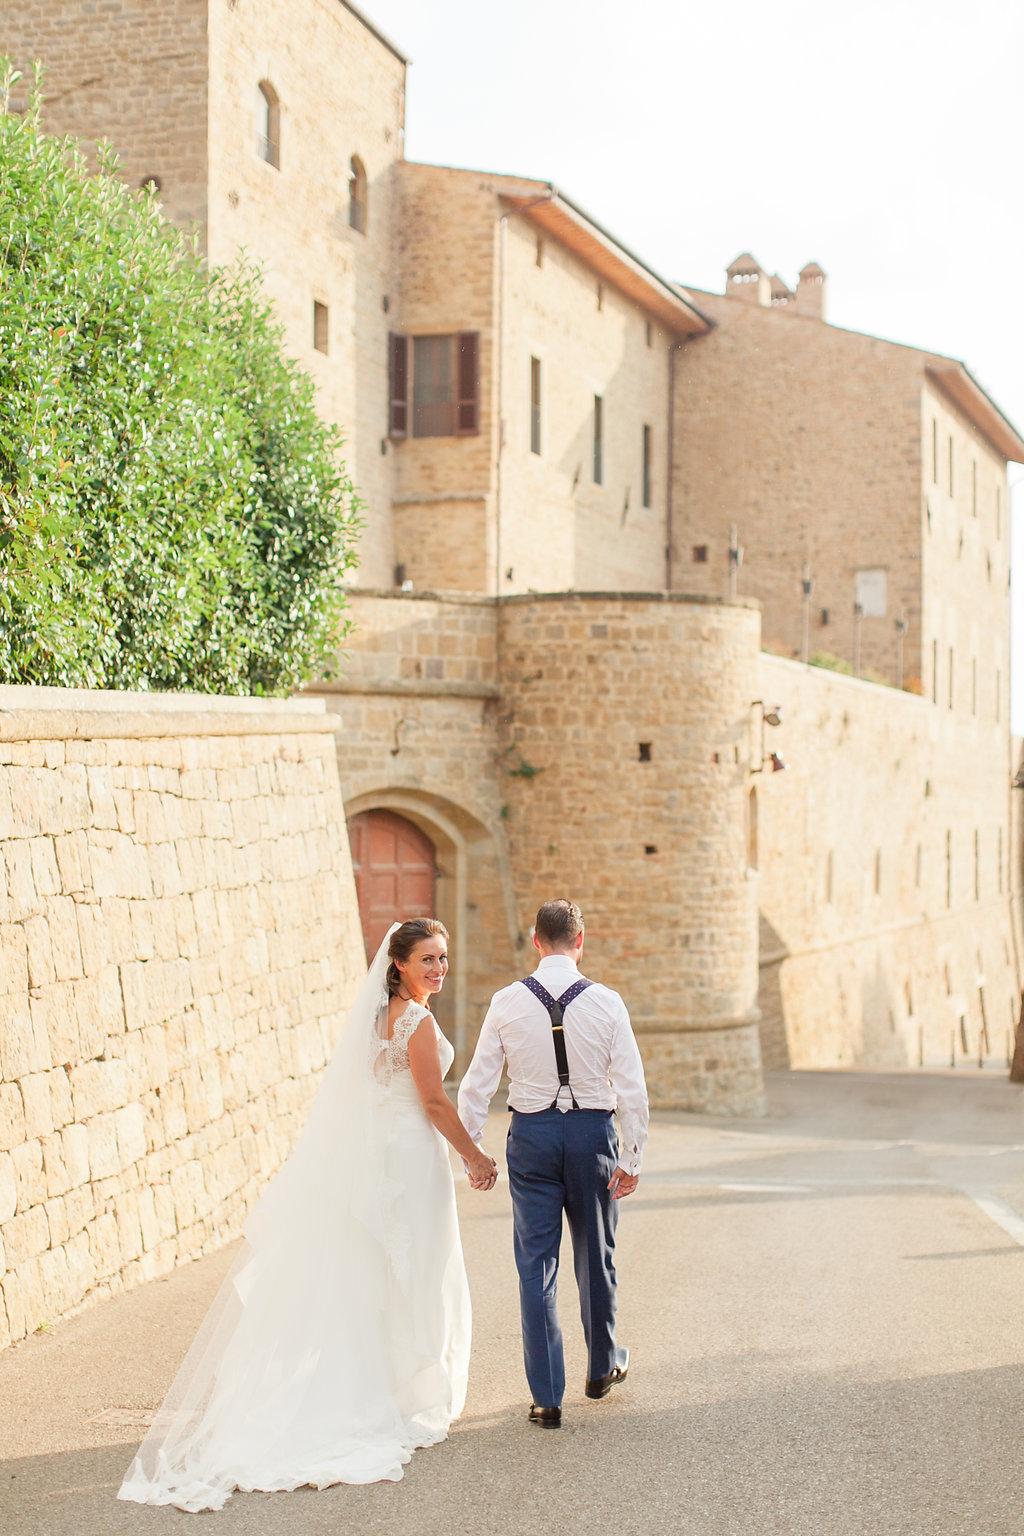 castelfalfi-tuscany-wedding-photographer-roberta-facchini-374